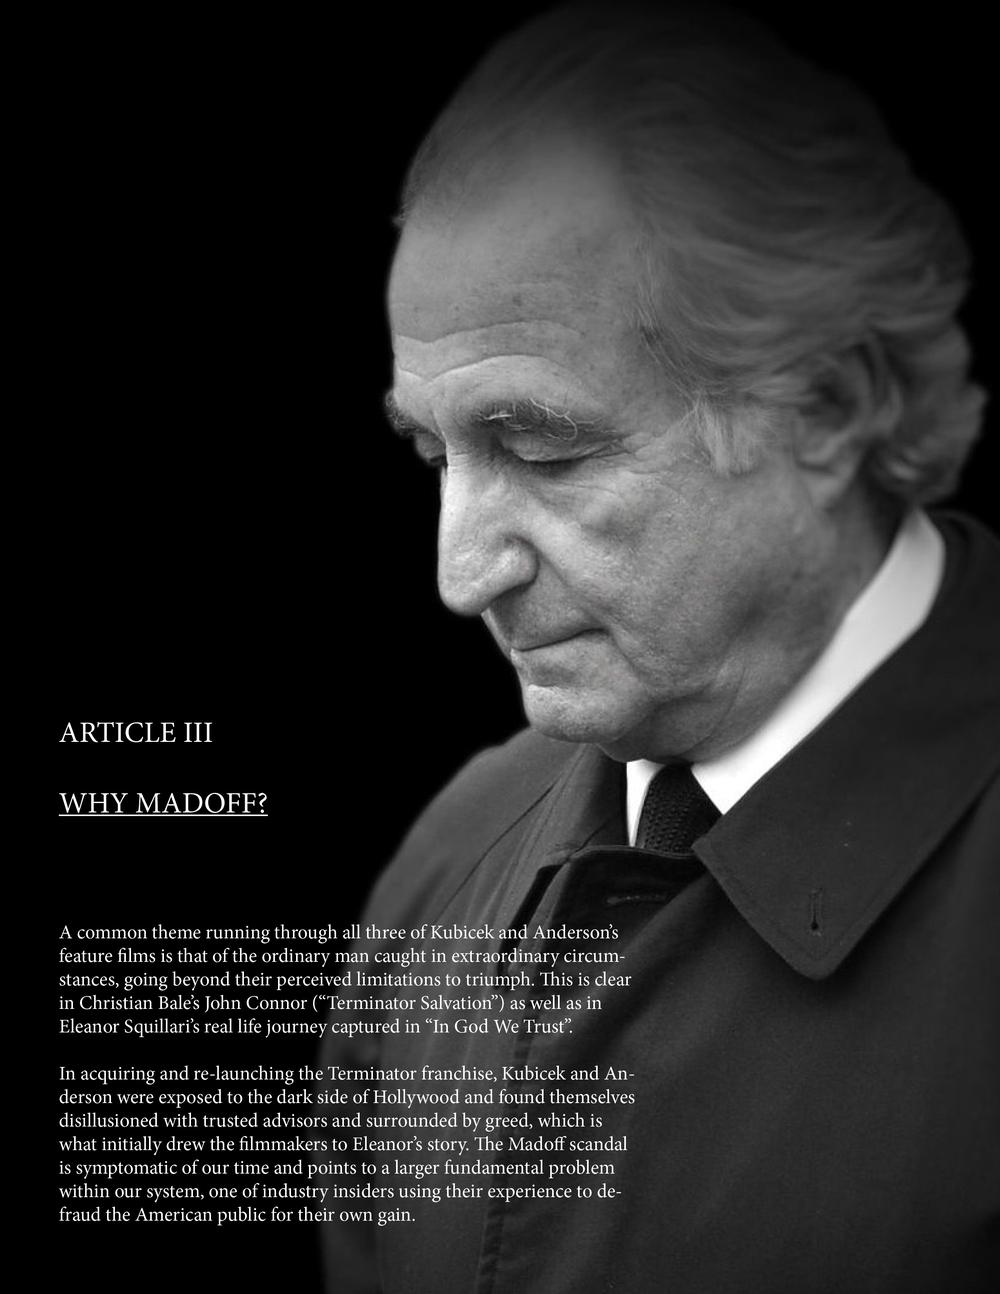 Madoff Page 2.jpg